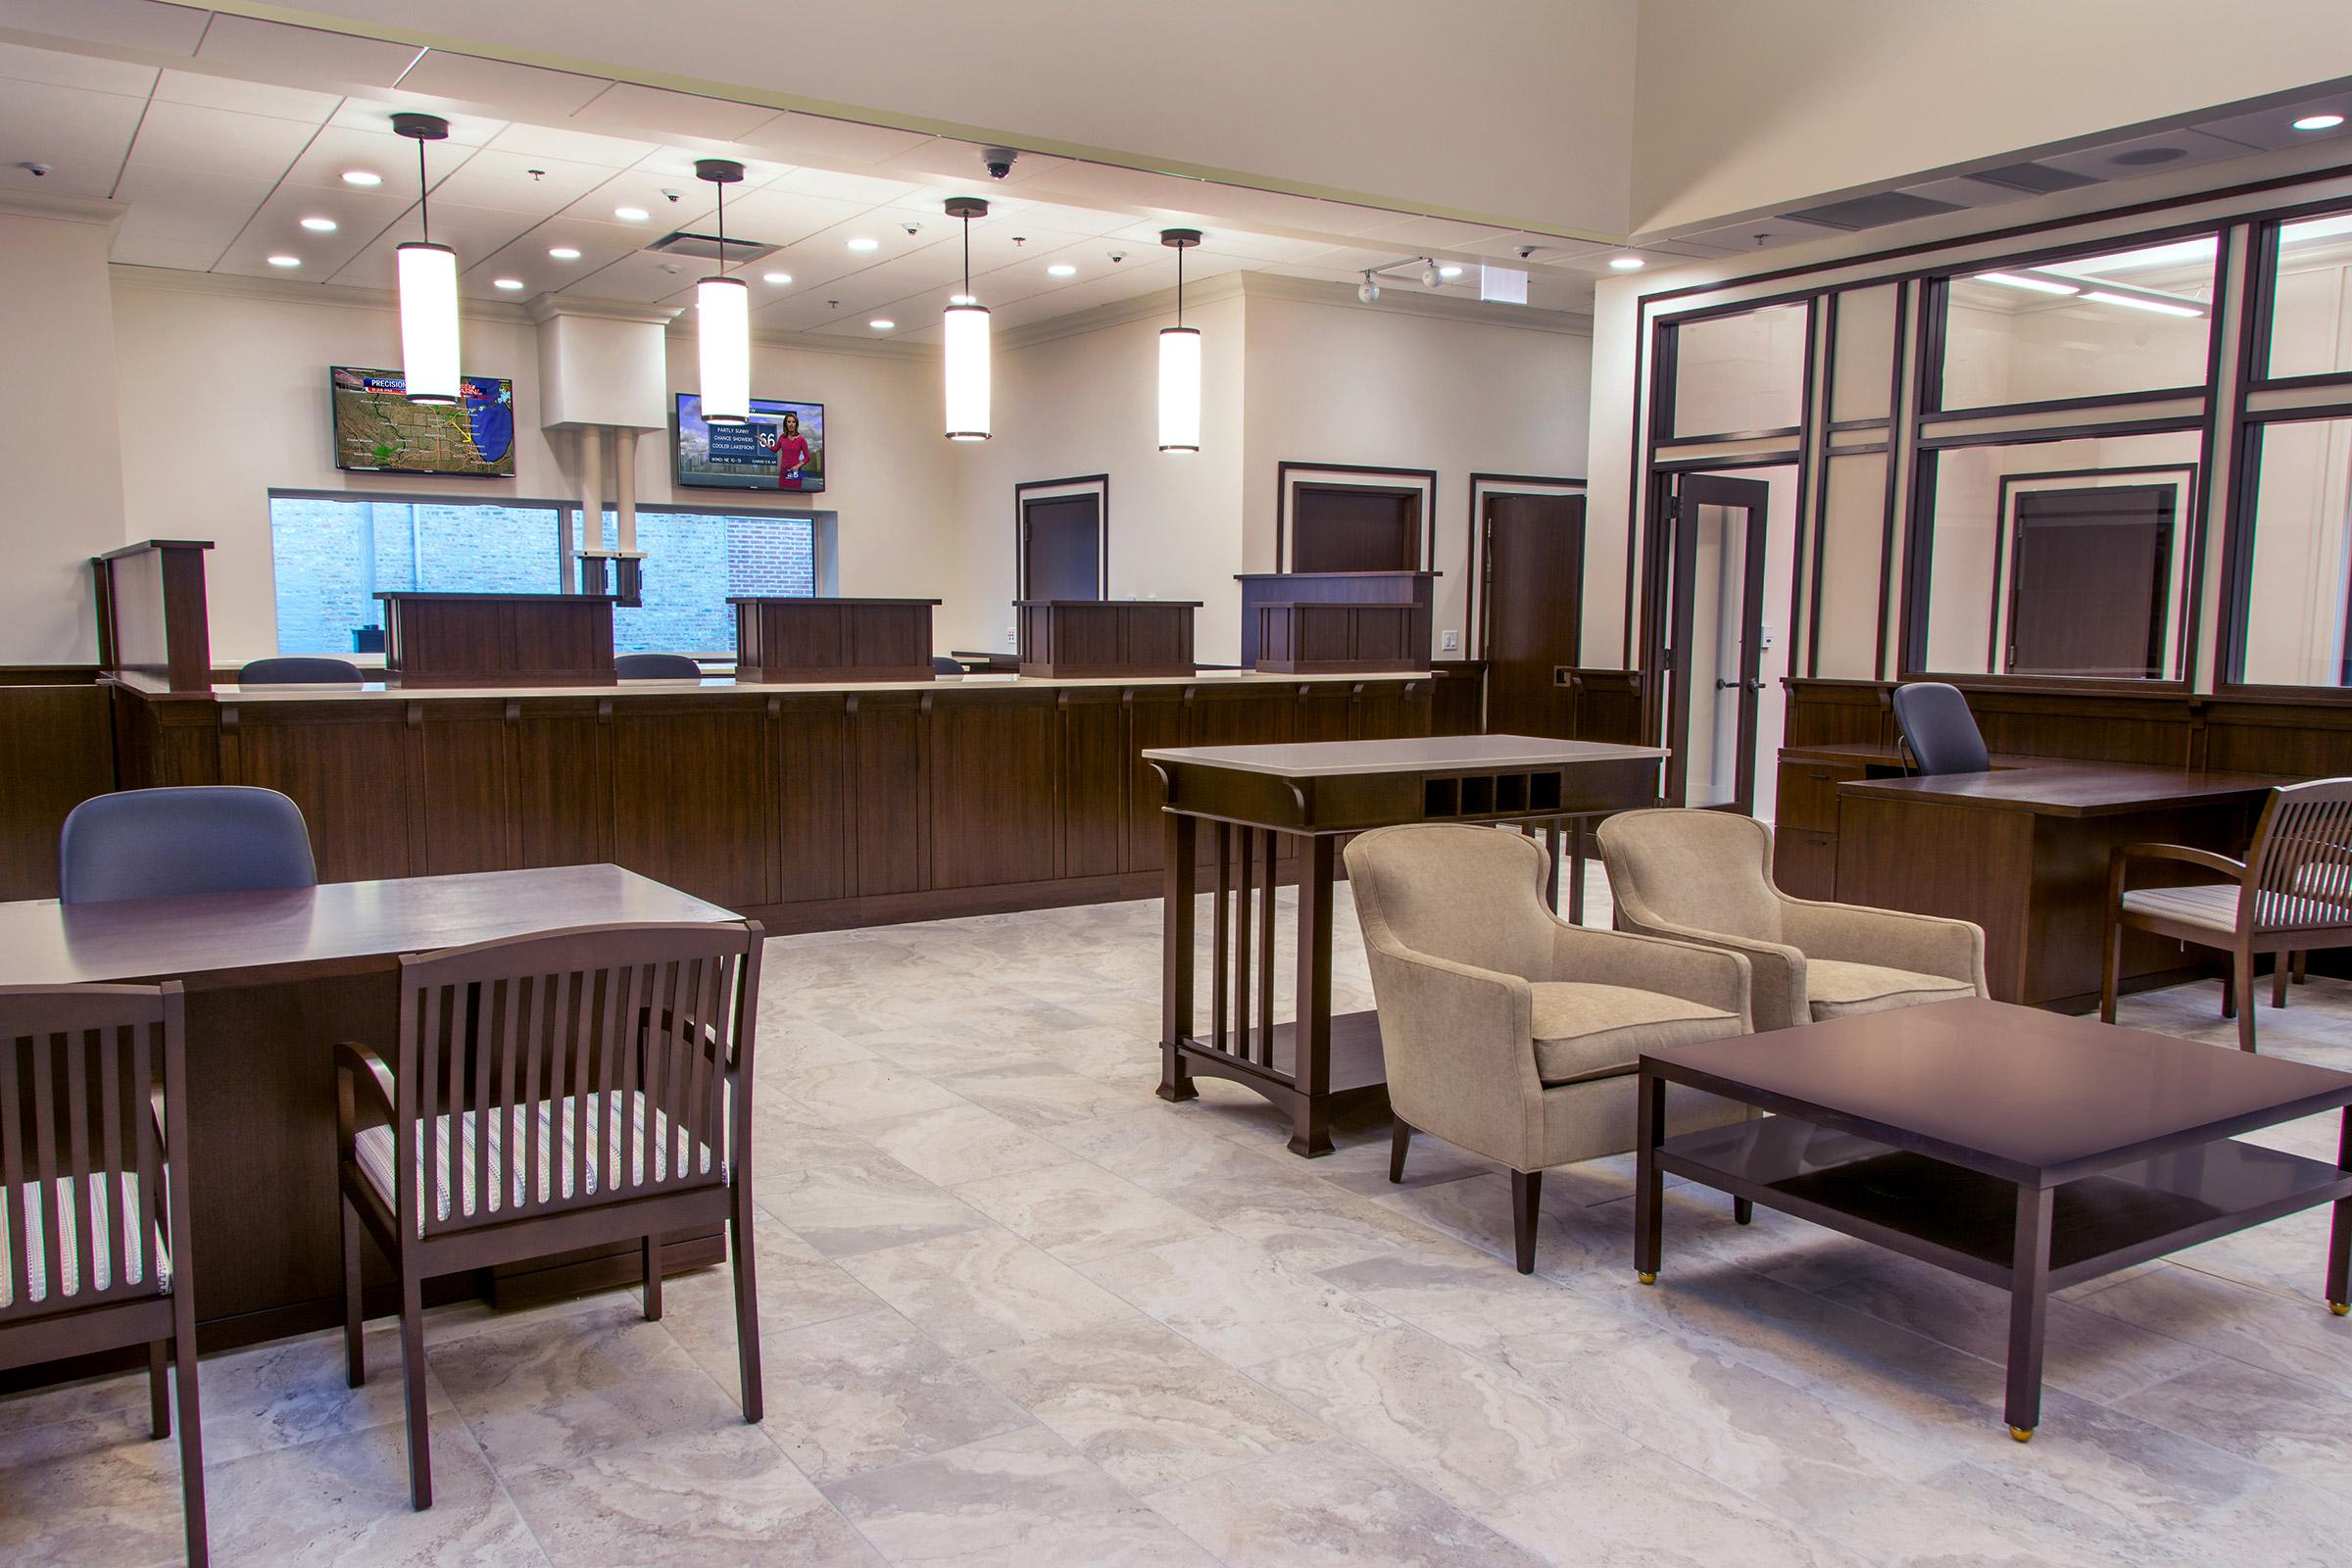 Interior view of Wintrust Bank Mayfair.